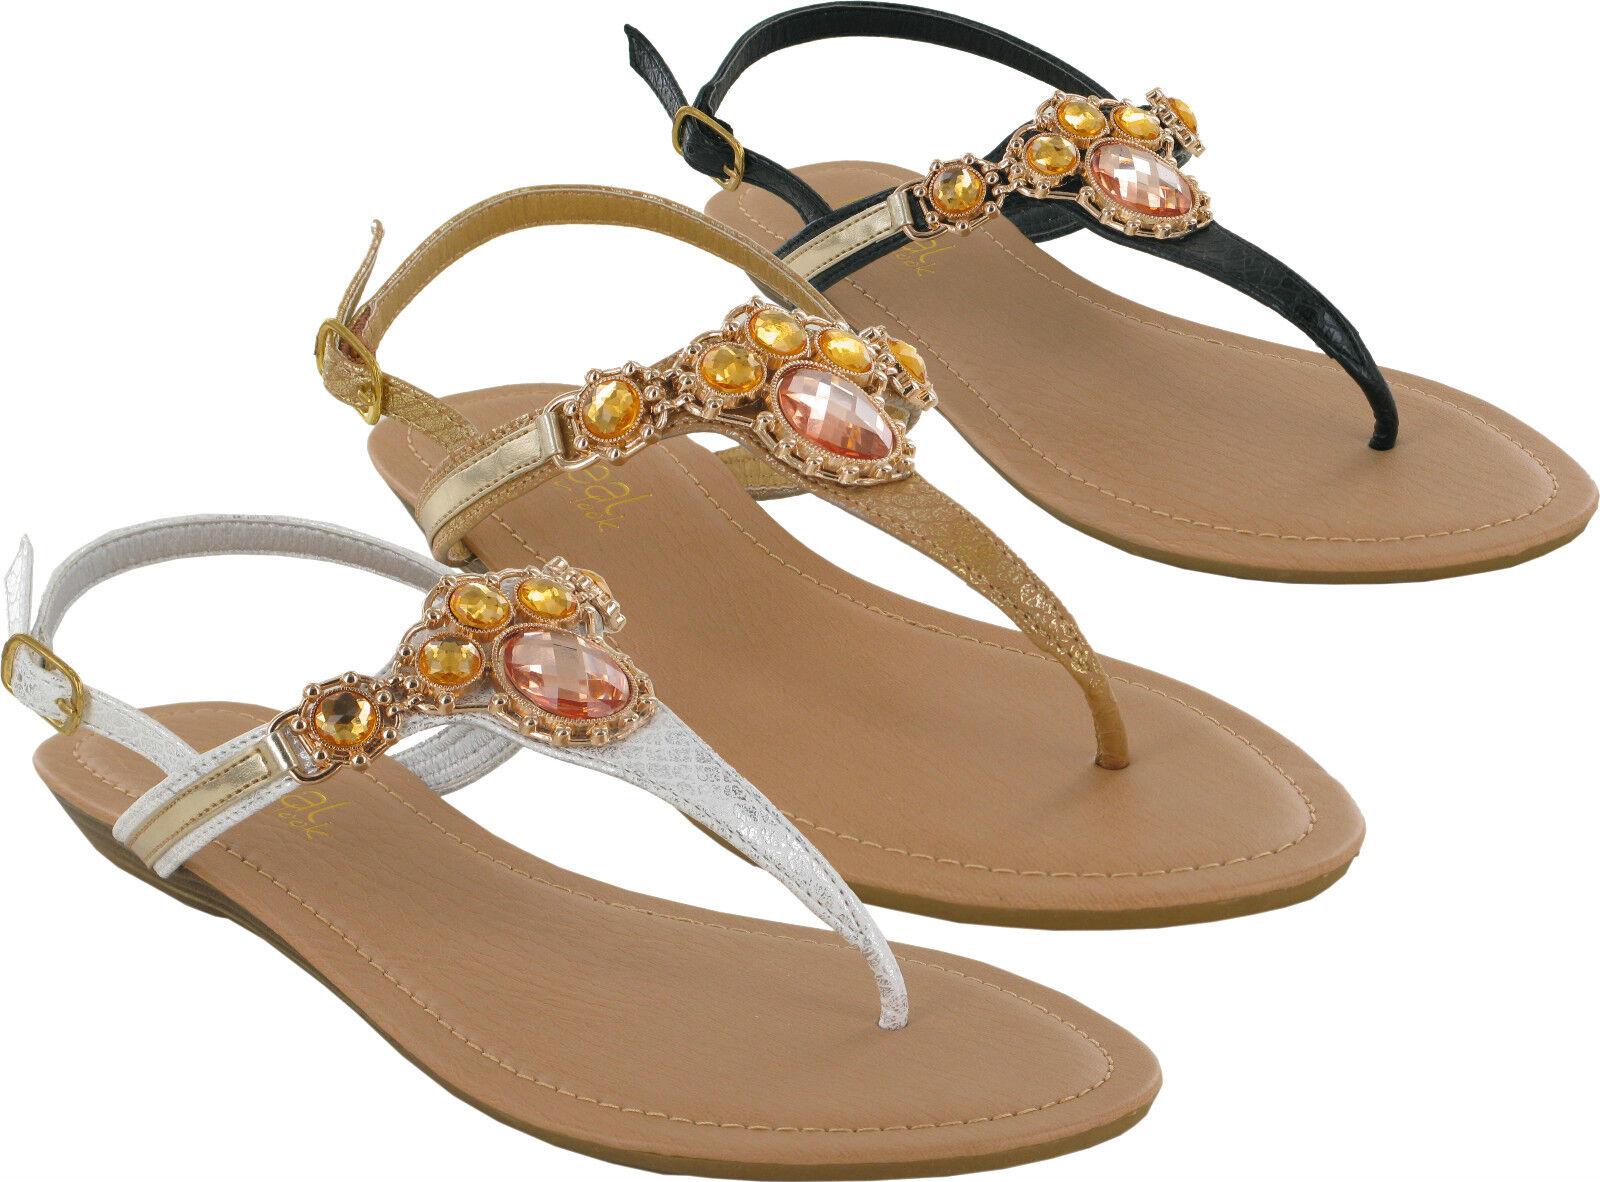 LADIES BACK BUCKLE DIAMOND FLAT MULE SUMMER 3-8 BEACH SANDALS UK SIZES 3-8 SUMMER d3003f